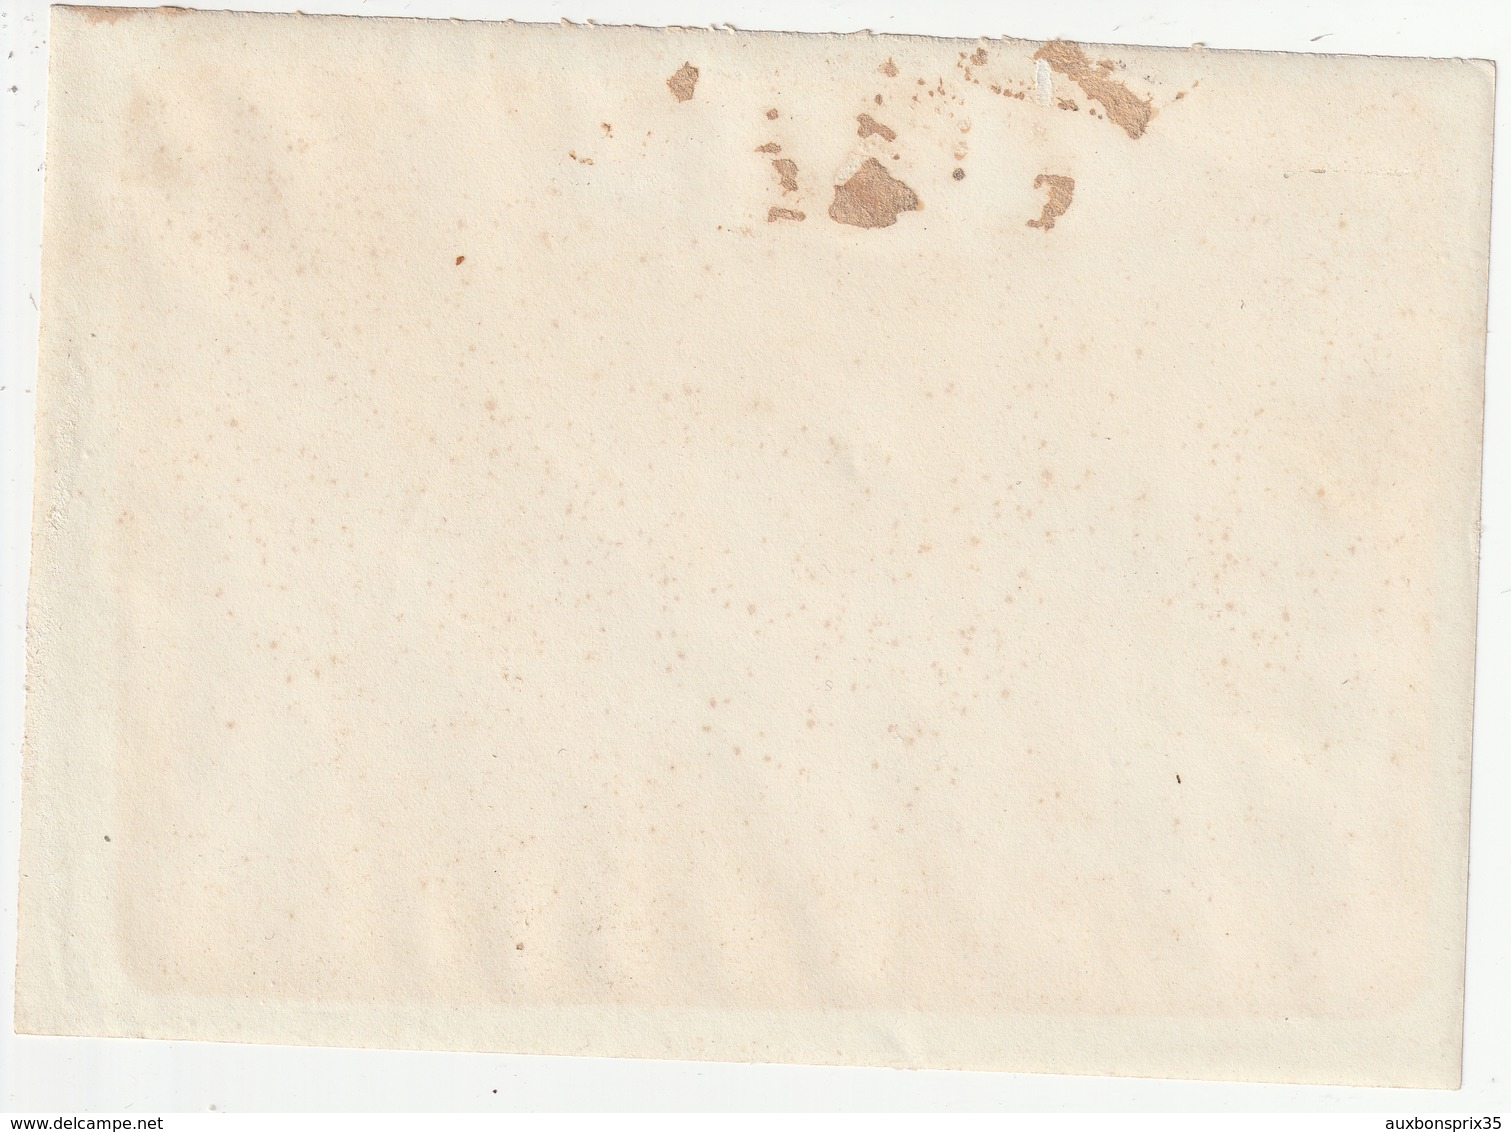 PHOTO - MARECHAL FERRANT - 24 JUIN 1903 - Métiers